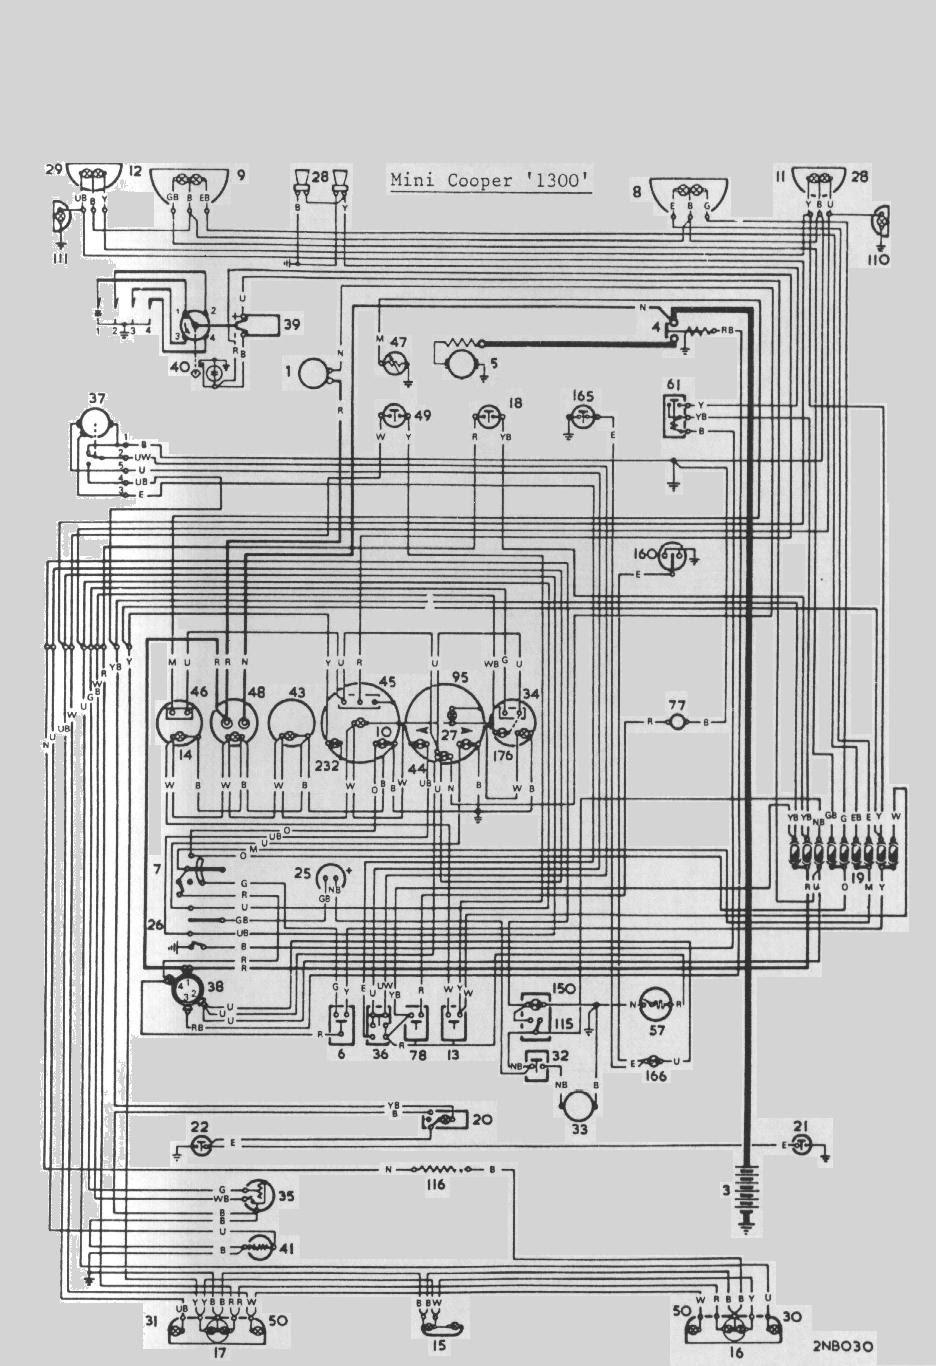 2002 Mini Cooper S Wiring Diagram 2002 Impala Radio Wiring Harness Begeboy Wiring Diagram Source